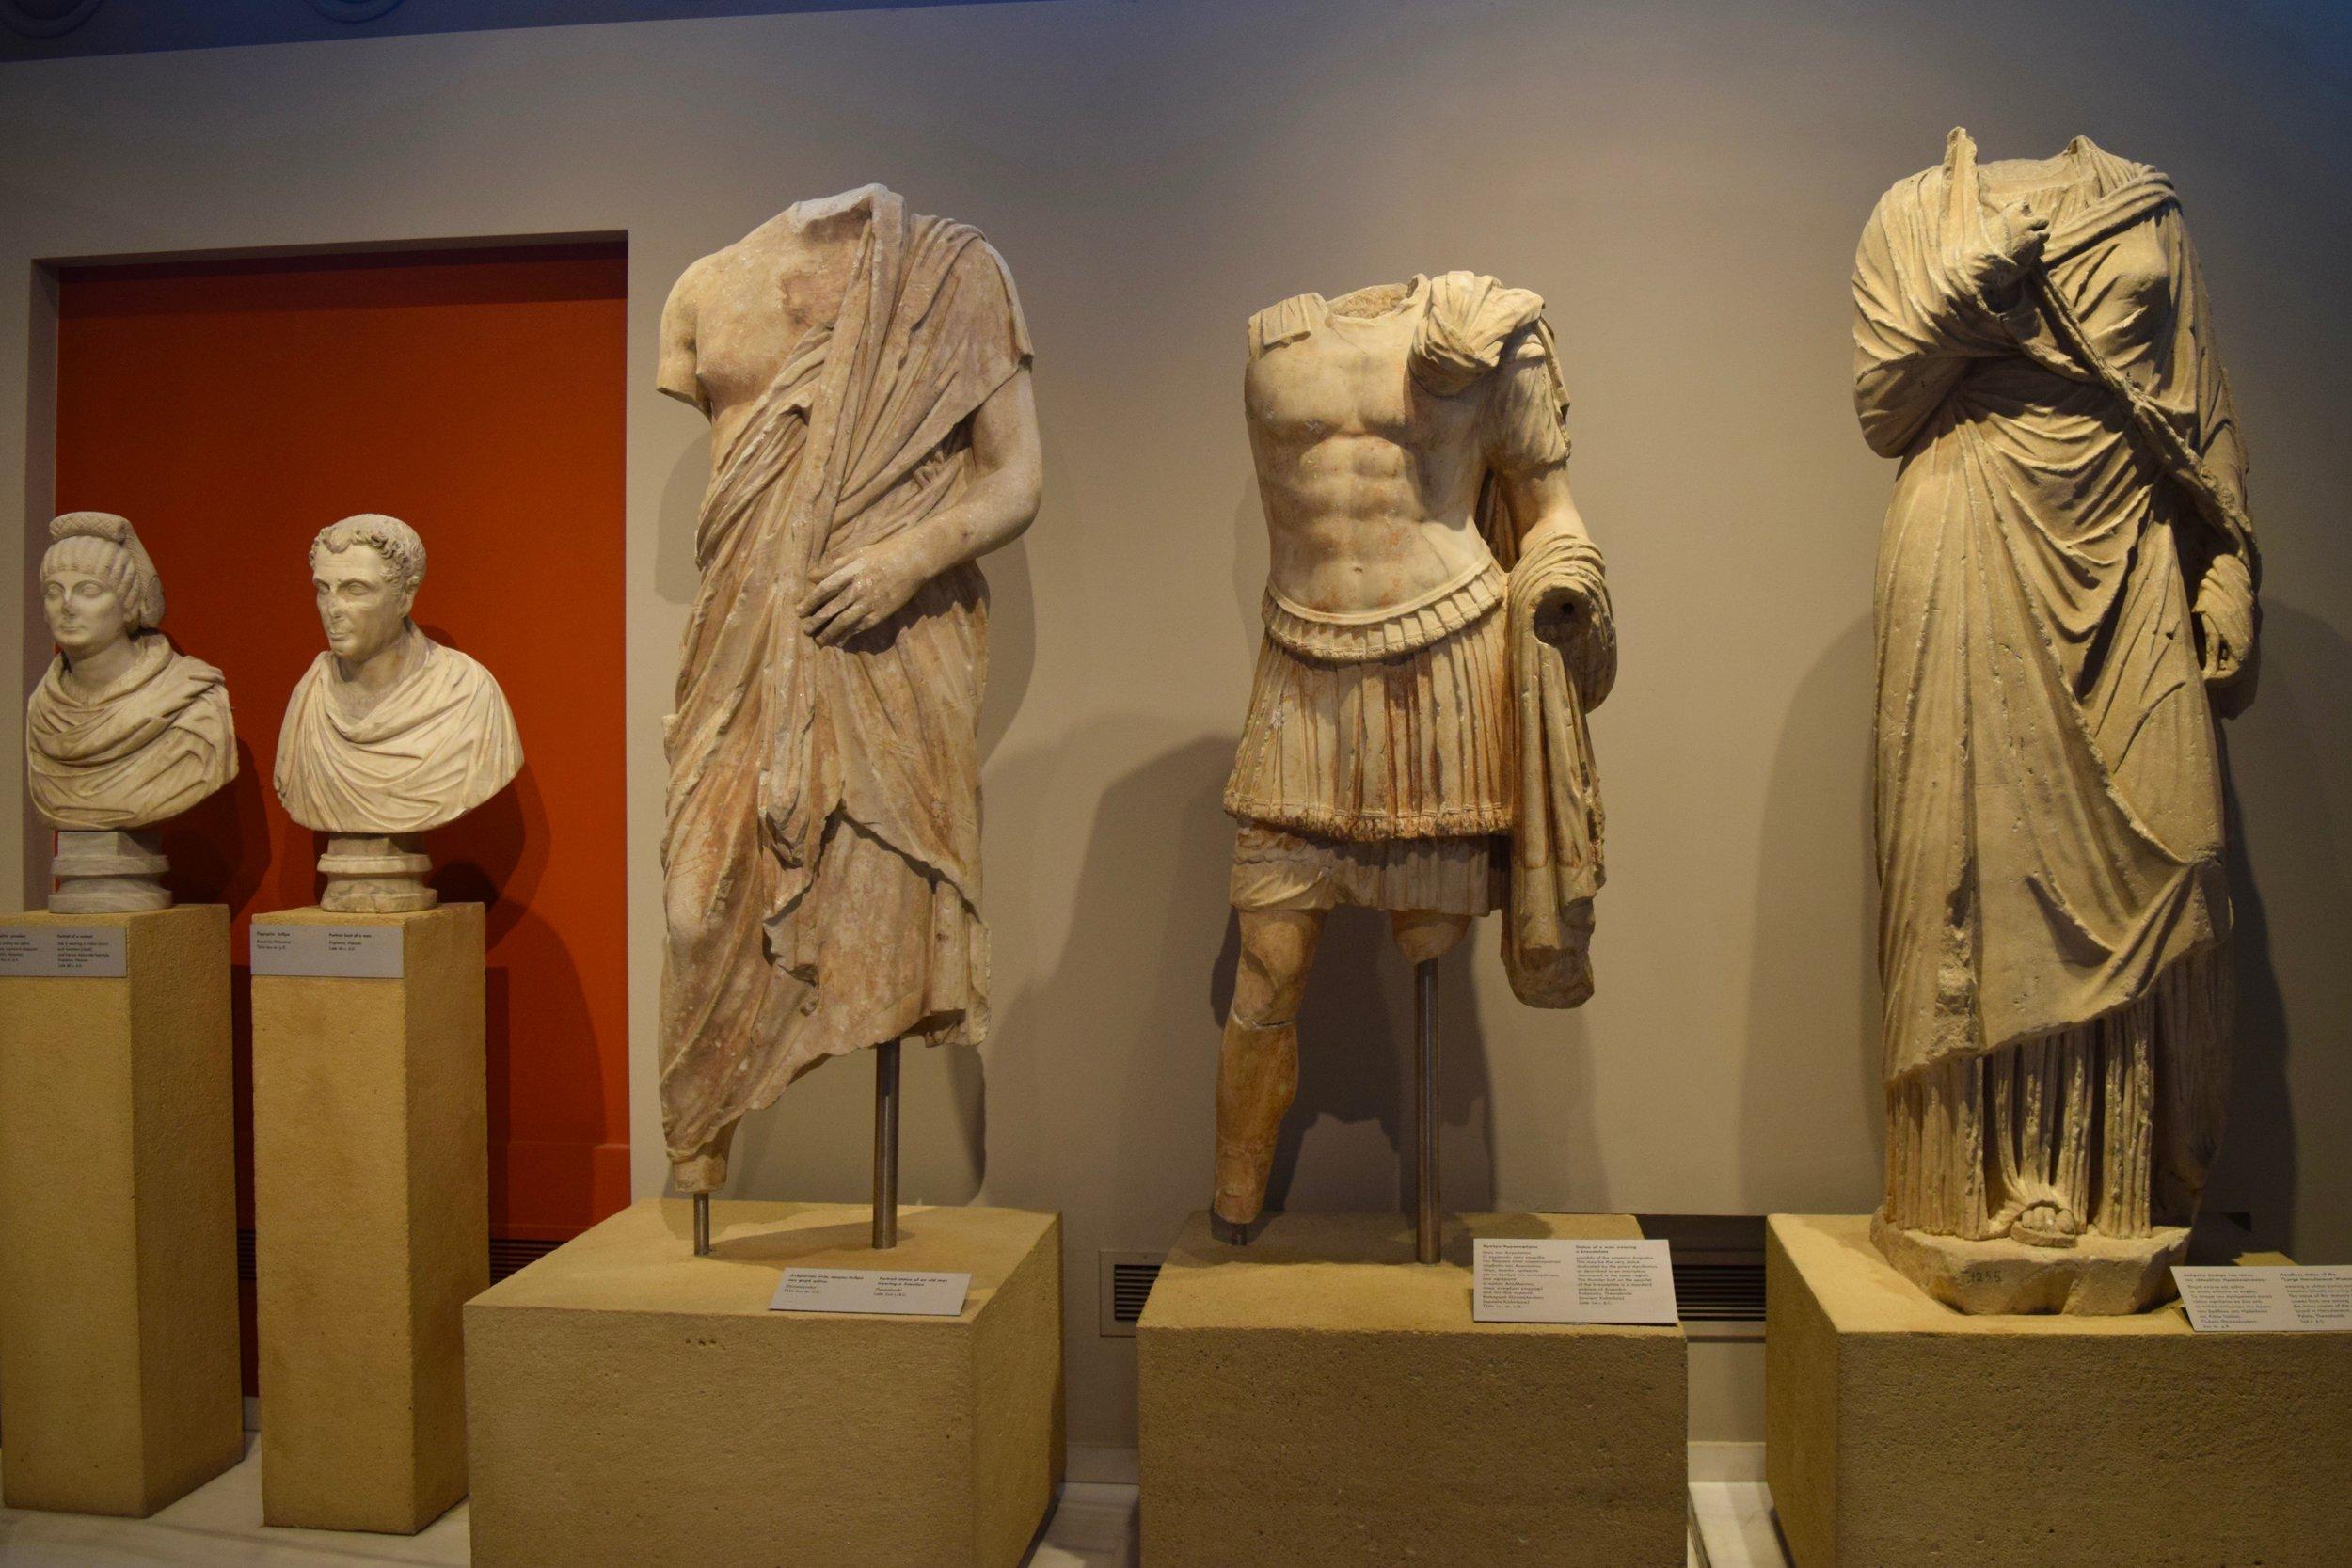 Kingdom of Macedonia exhibition hall